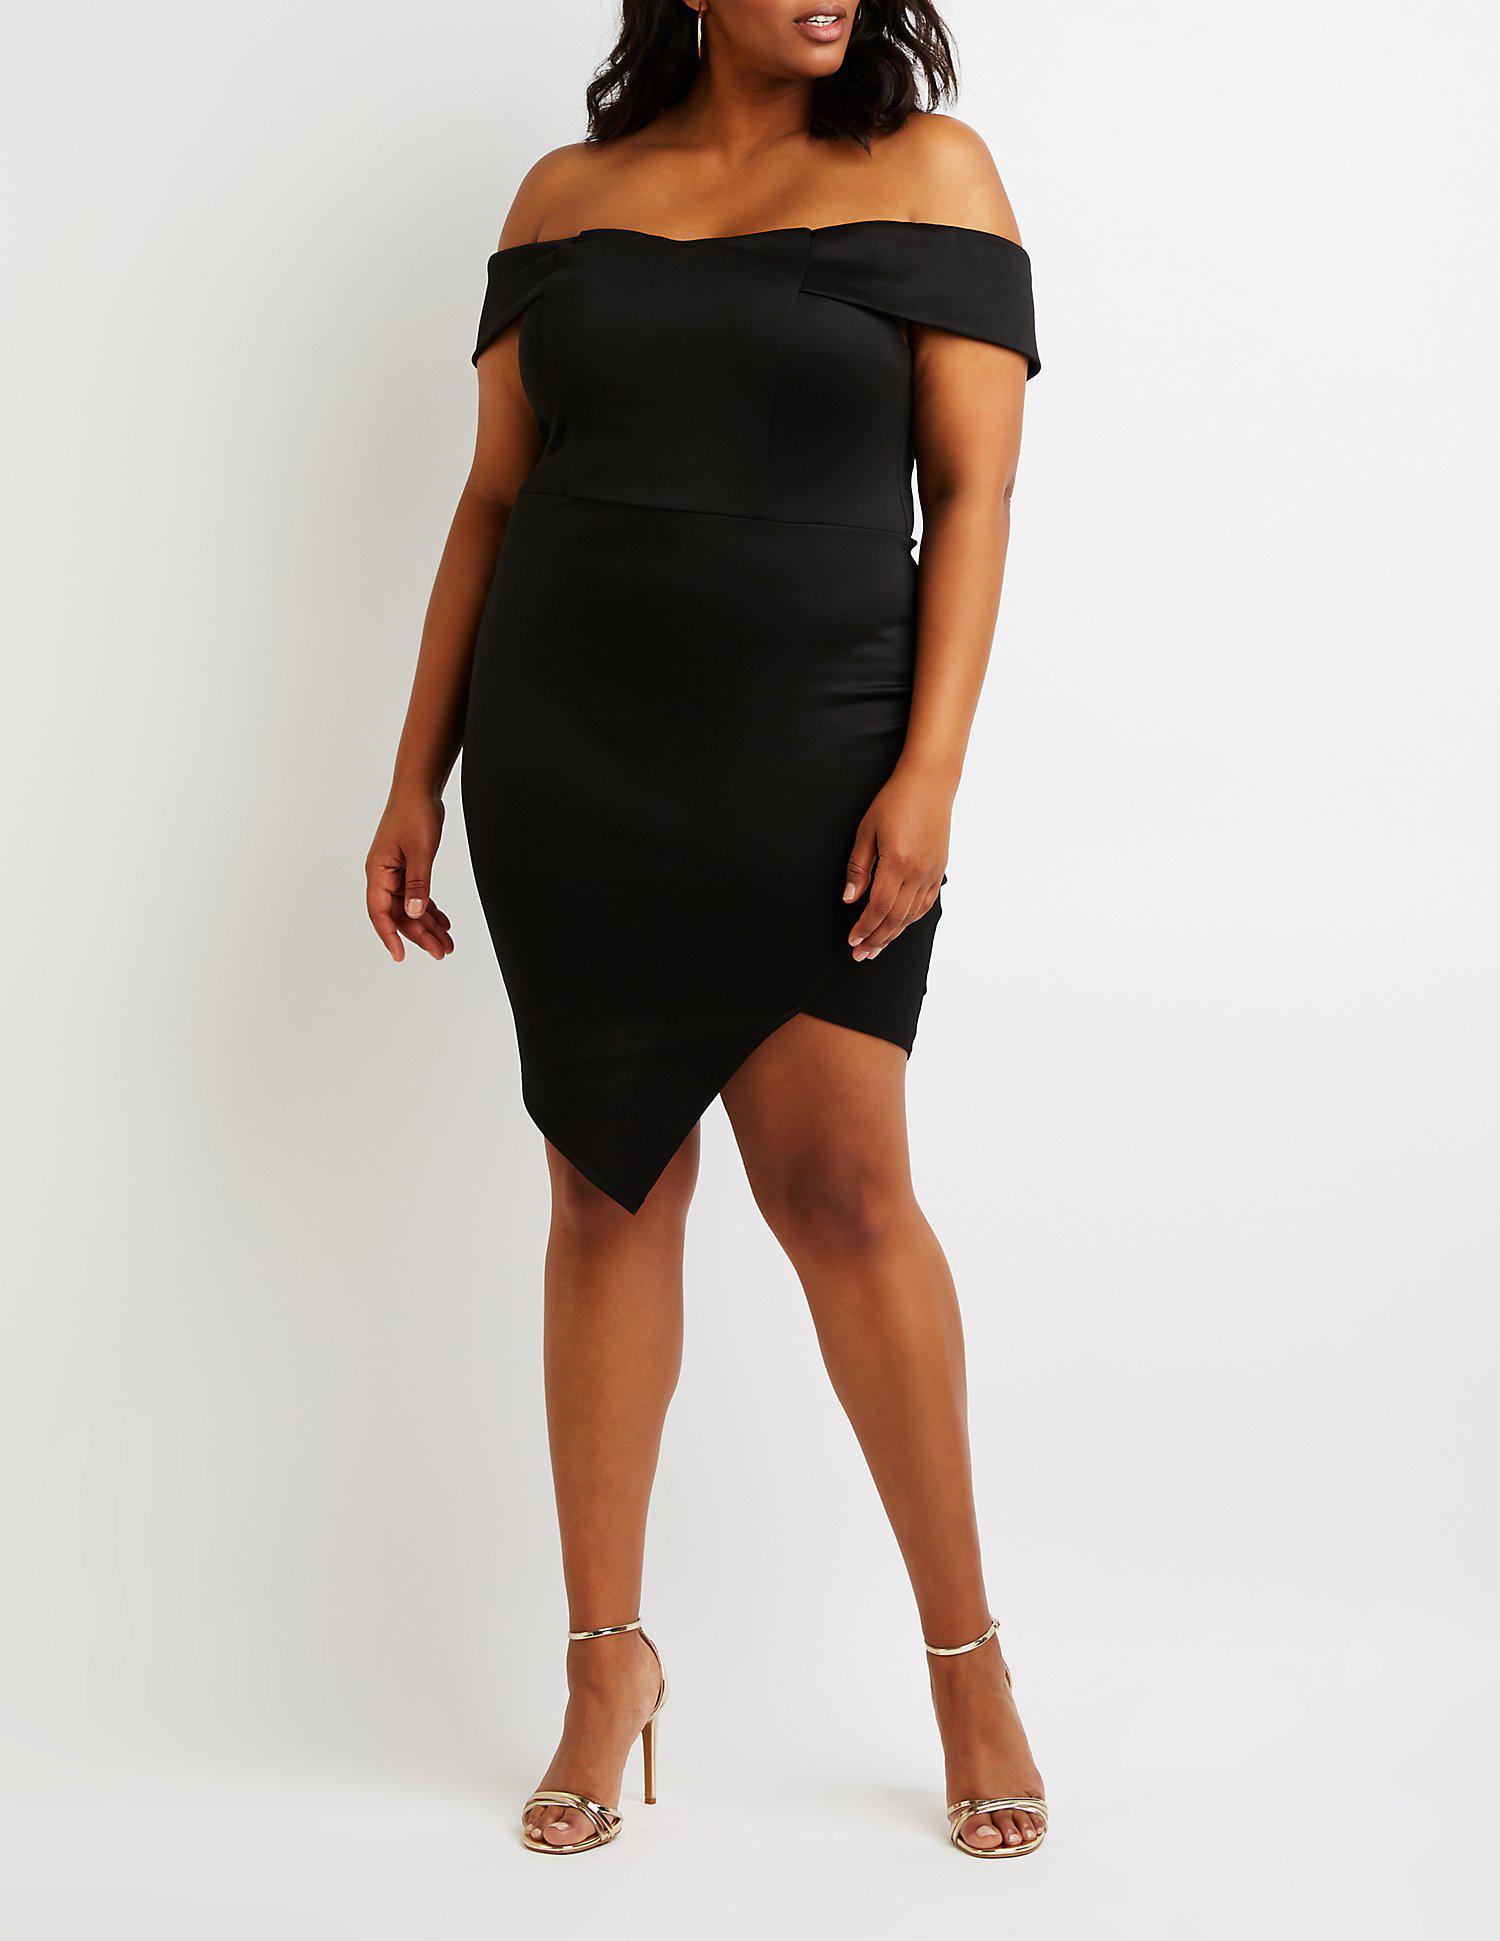 2d0a0411140 Lyst - Charlotte Russe Plus Size Off The Shoulder Dress in Black